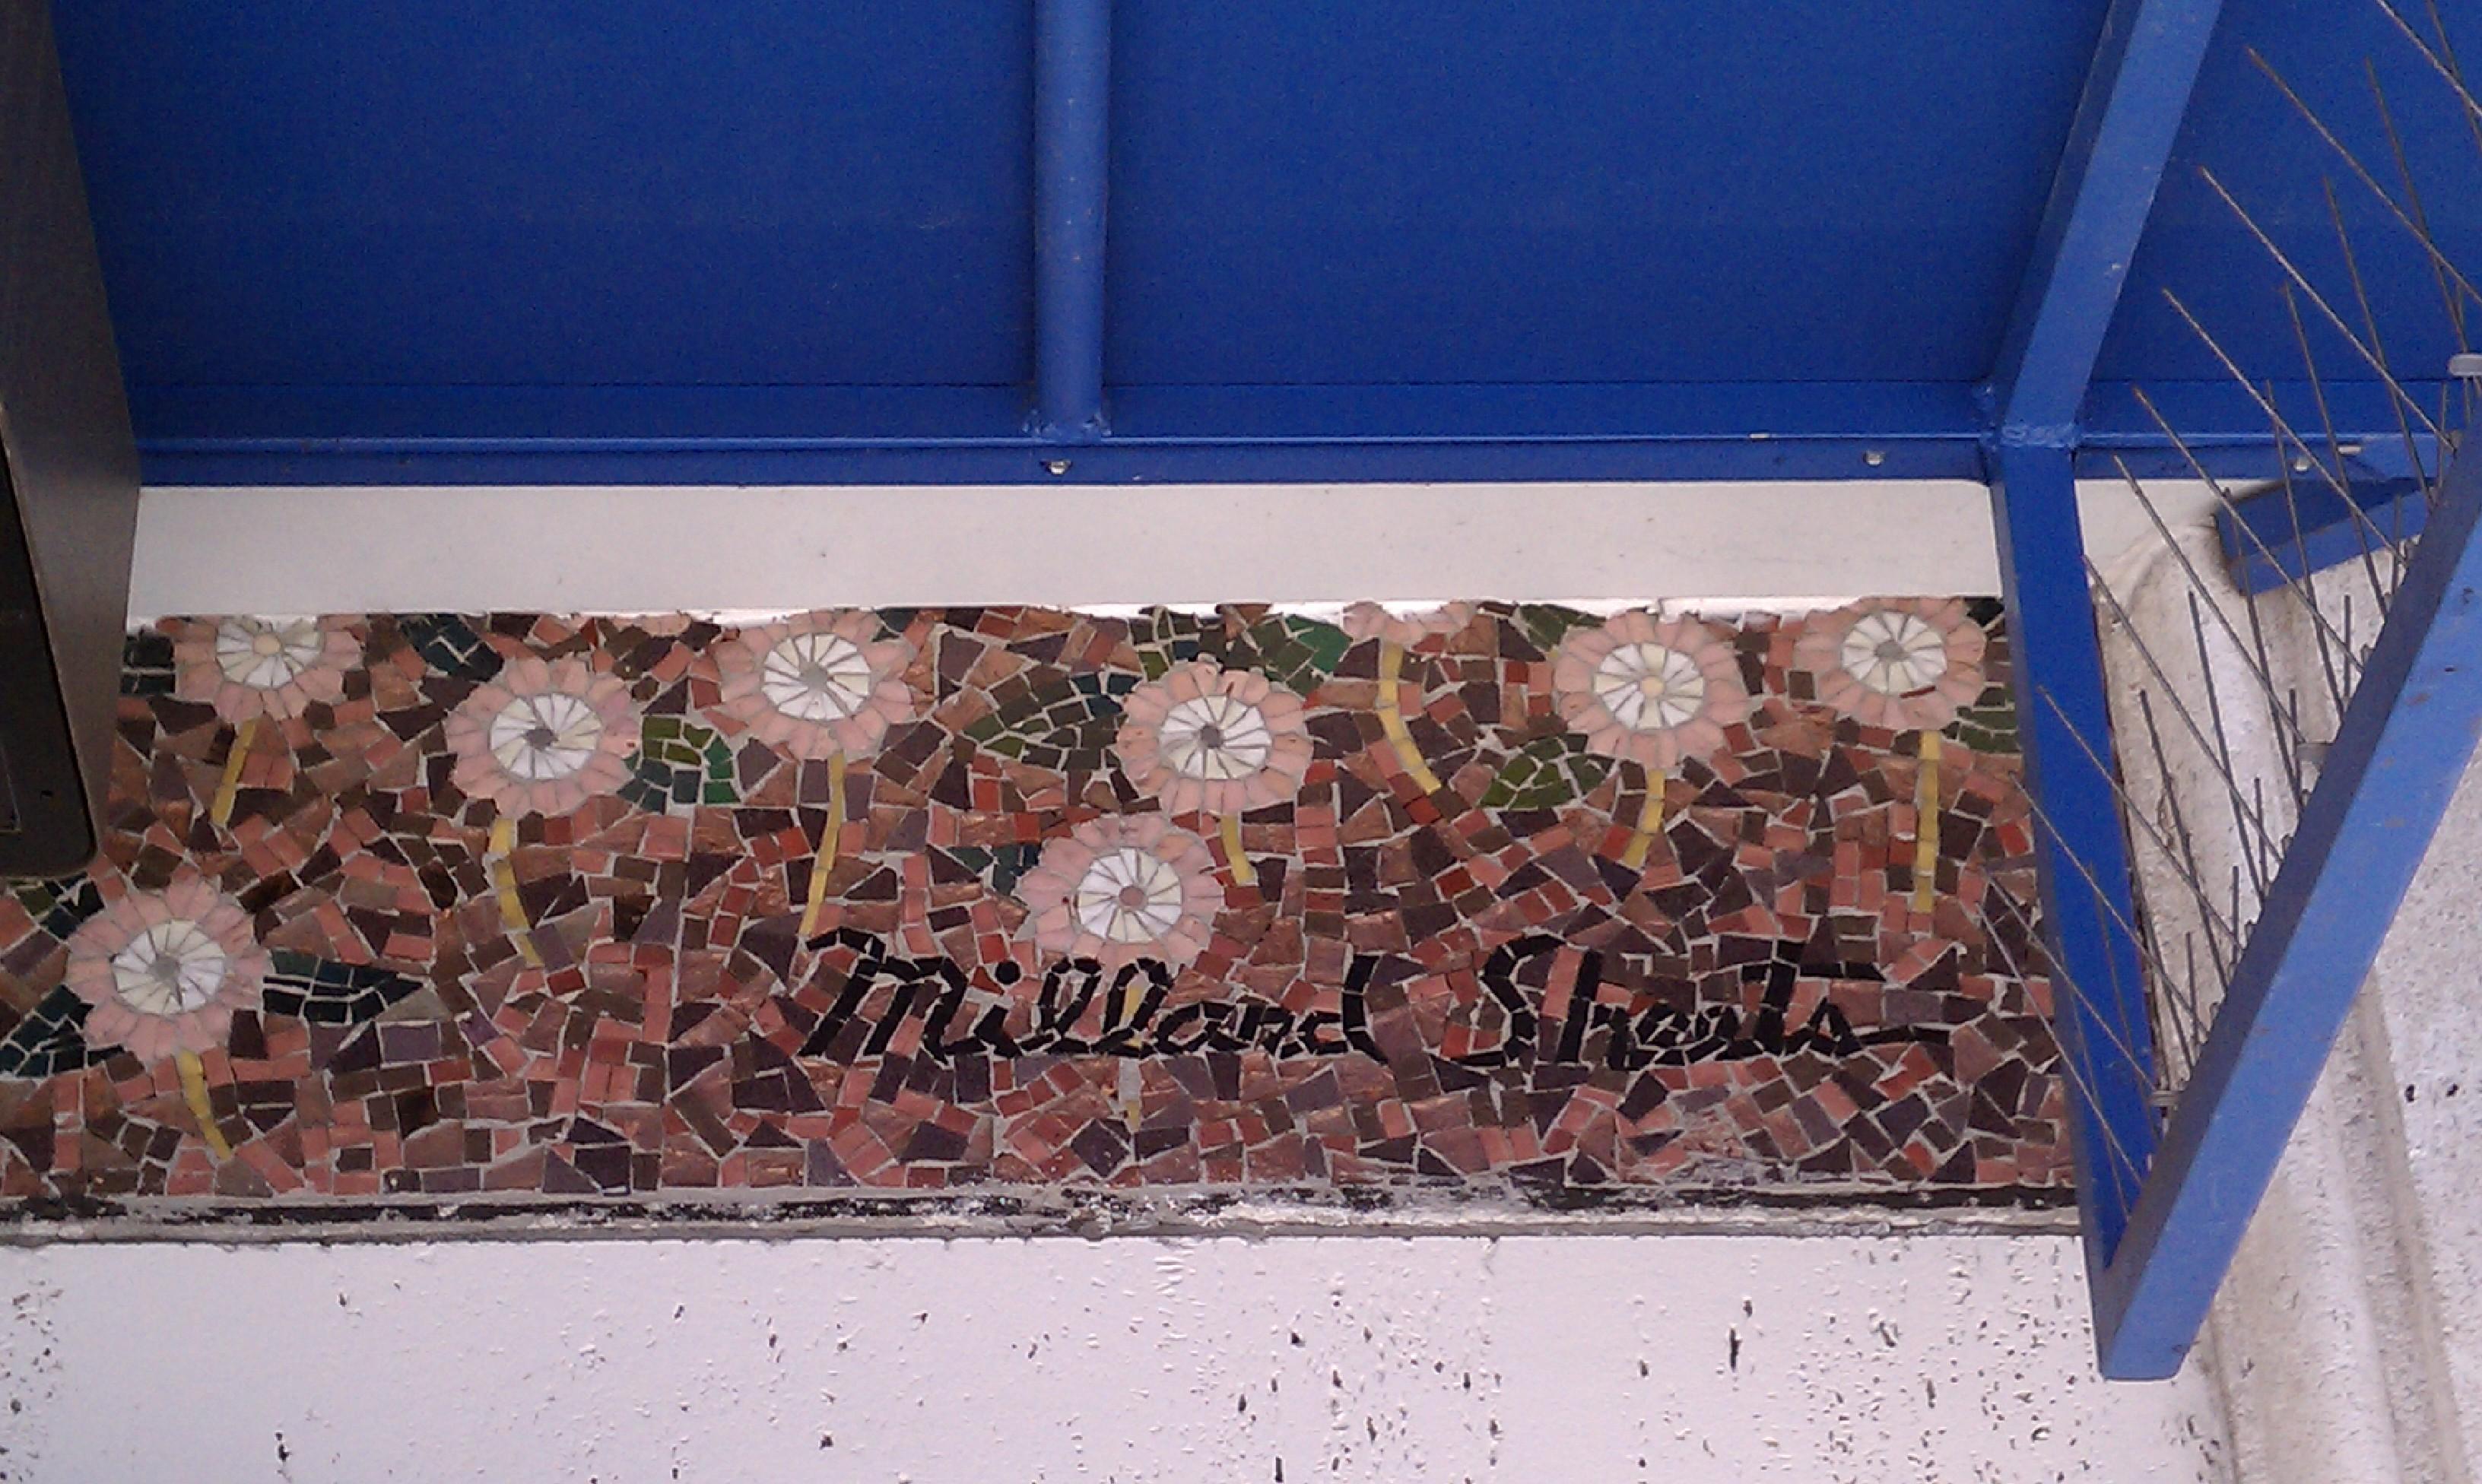 Awning sliced into Sheets Studio mosaic, cutting off signature, Highland Park